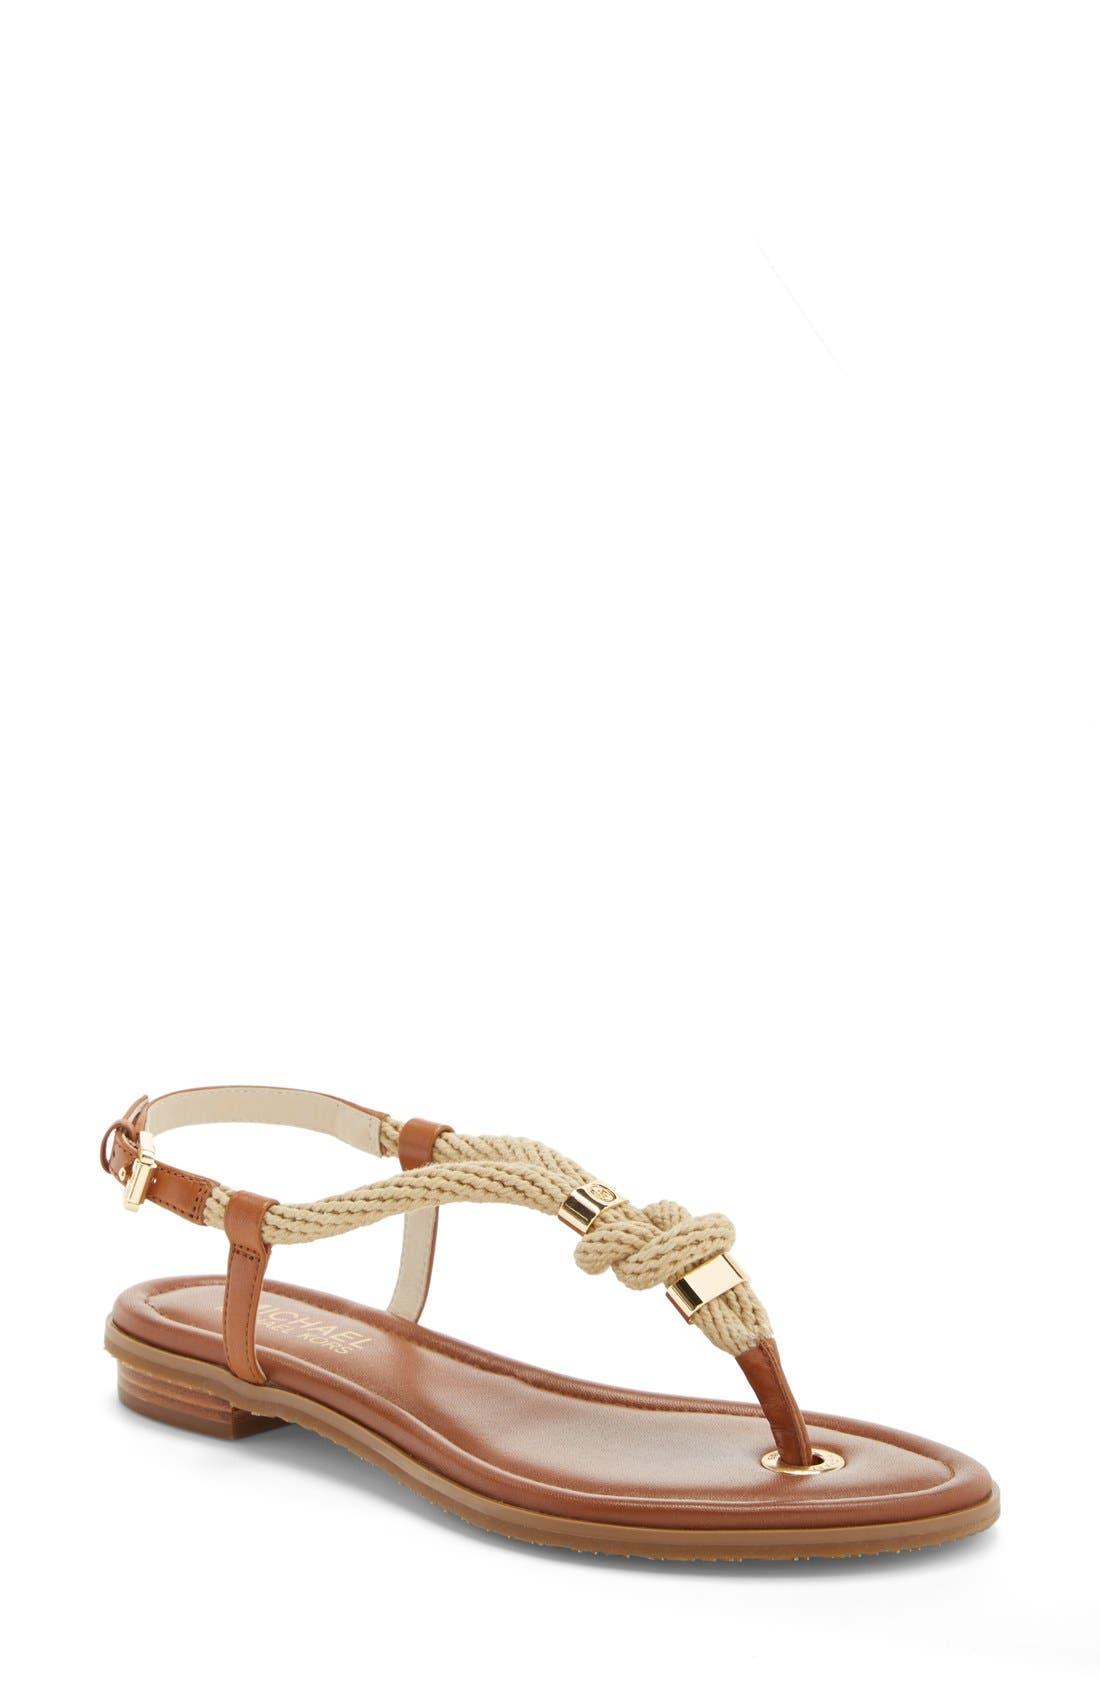 Main Image - MICHAEL Michael Kors 'Holly' Leather Thong Sandal (Women)